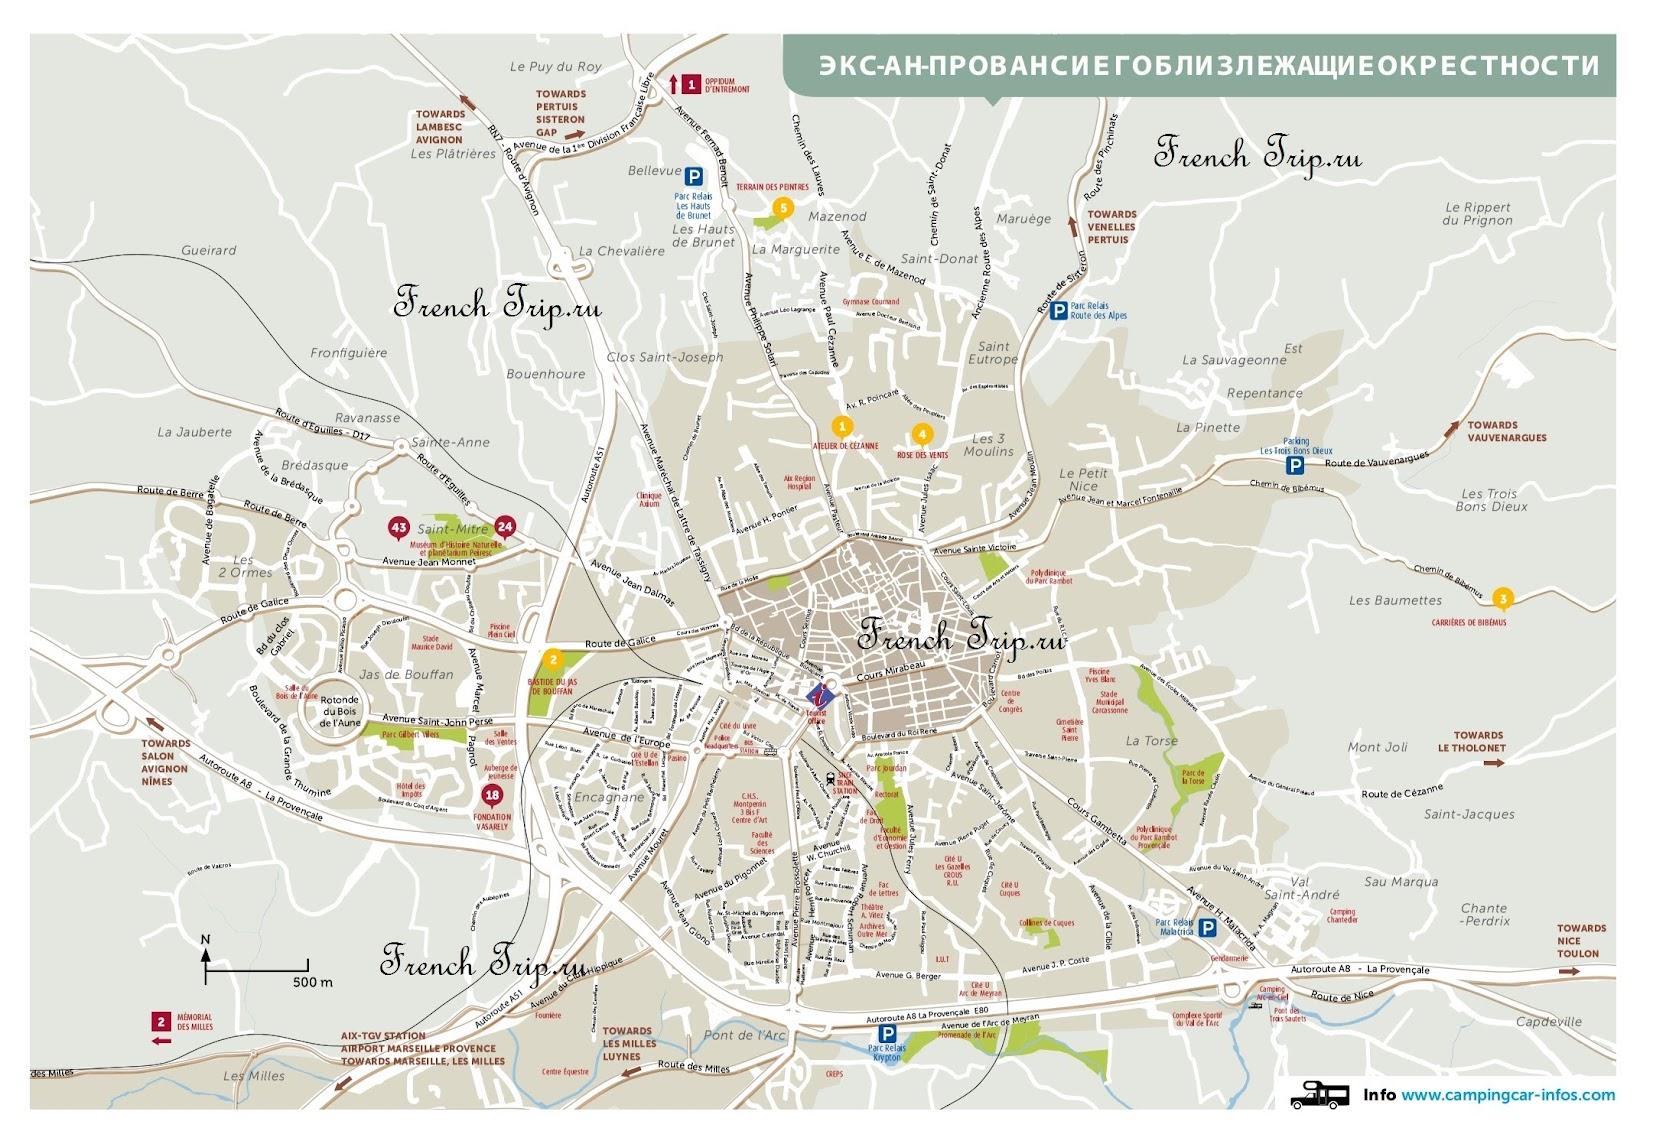 Маршрут вокруг Экс-ан-Прованса: по следам Сезанна